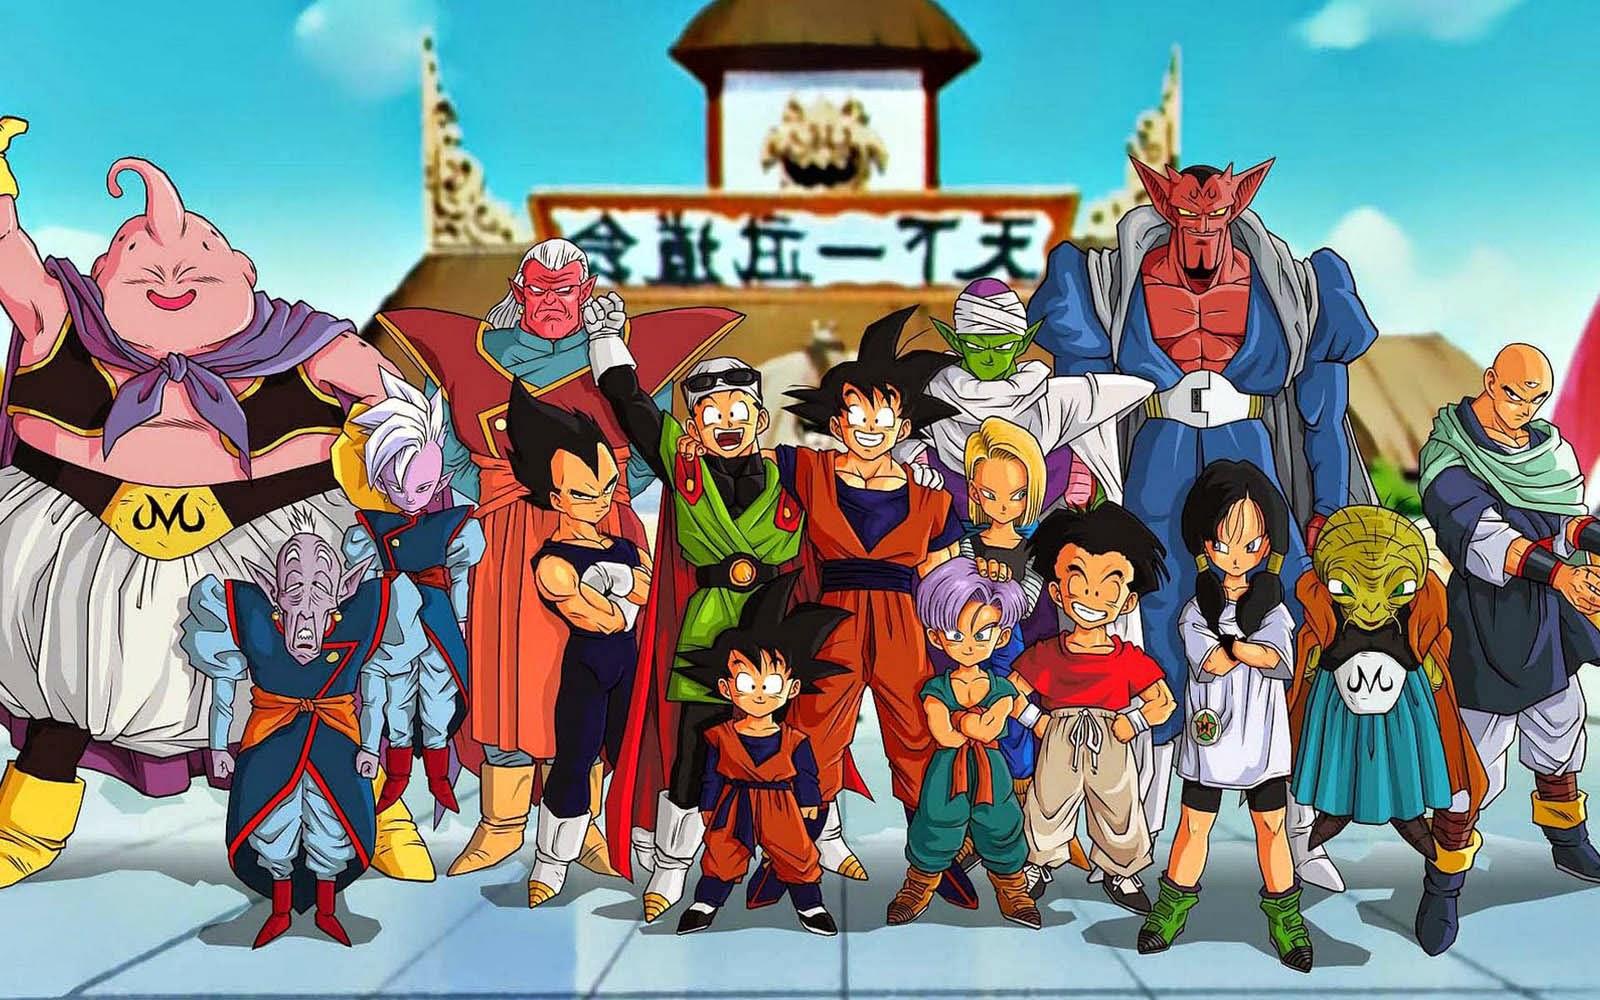 Download Wallpaper Gambar Kartun Dragon Ball Gambar Kartun